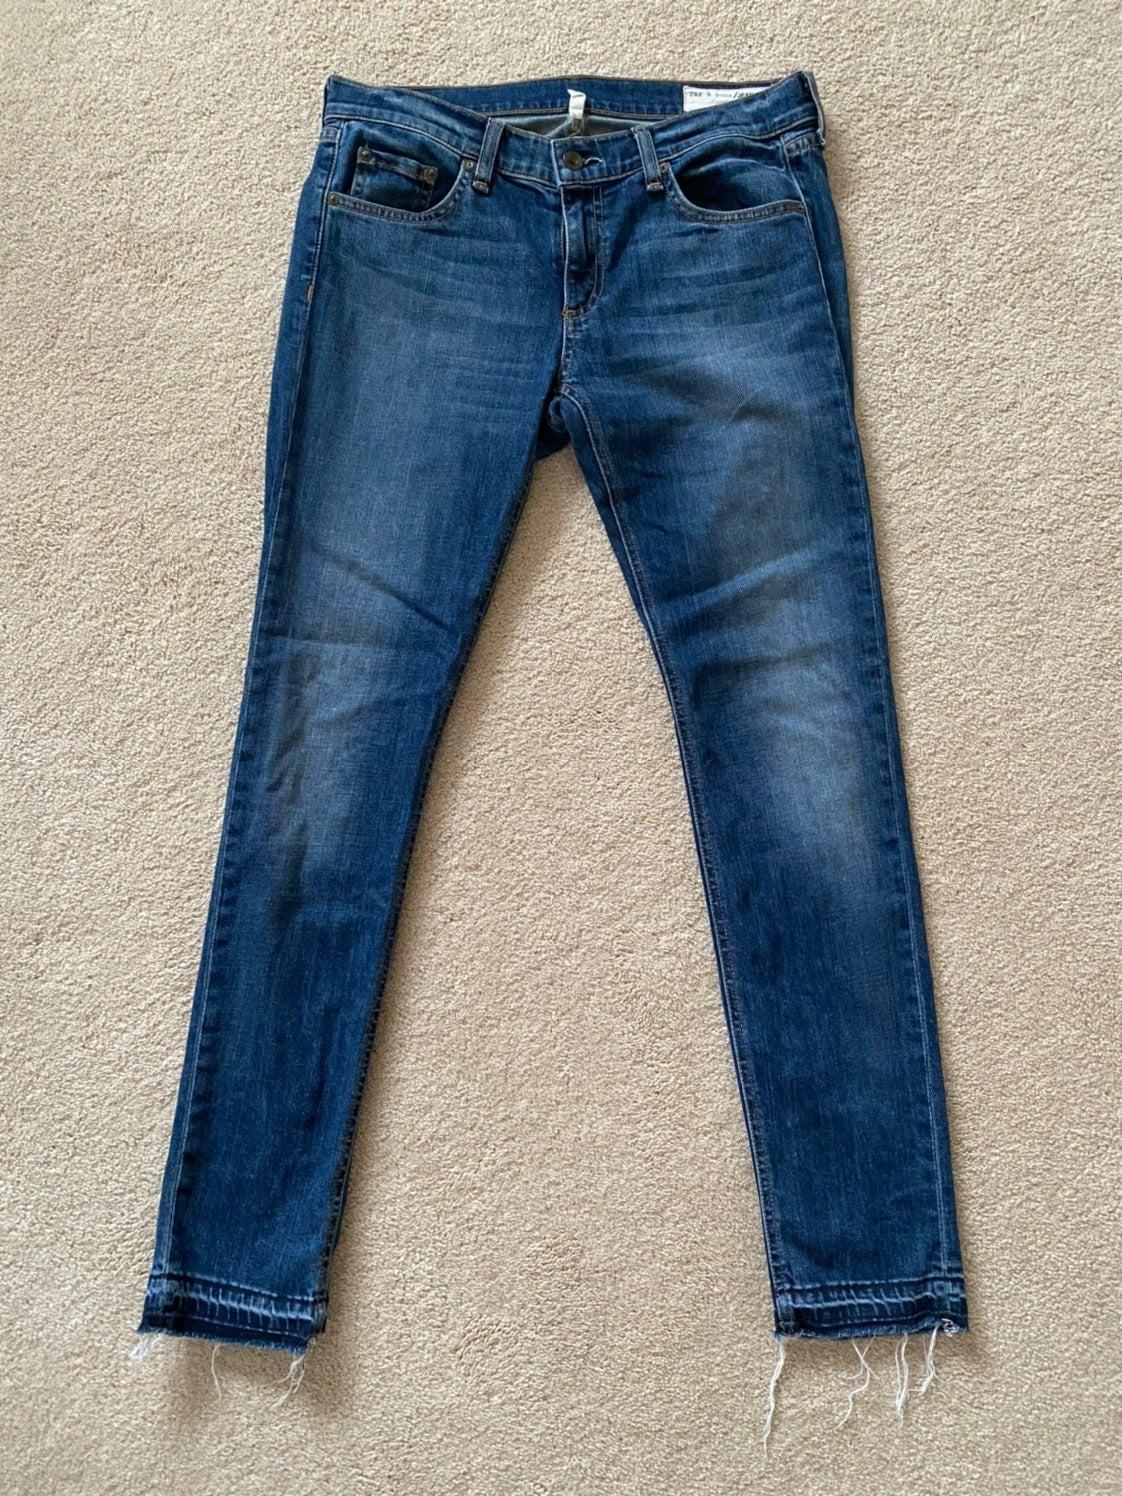 Womens Rag & Bone Jeans